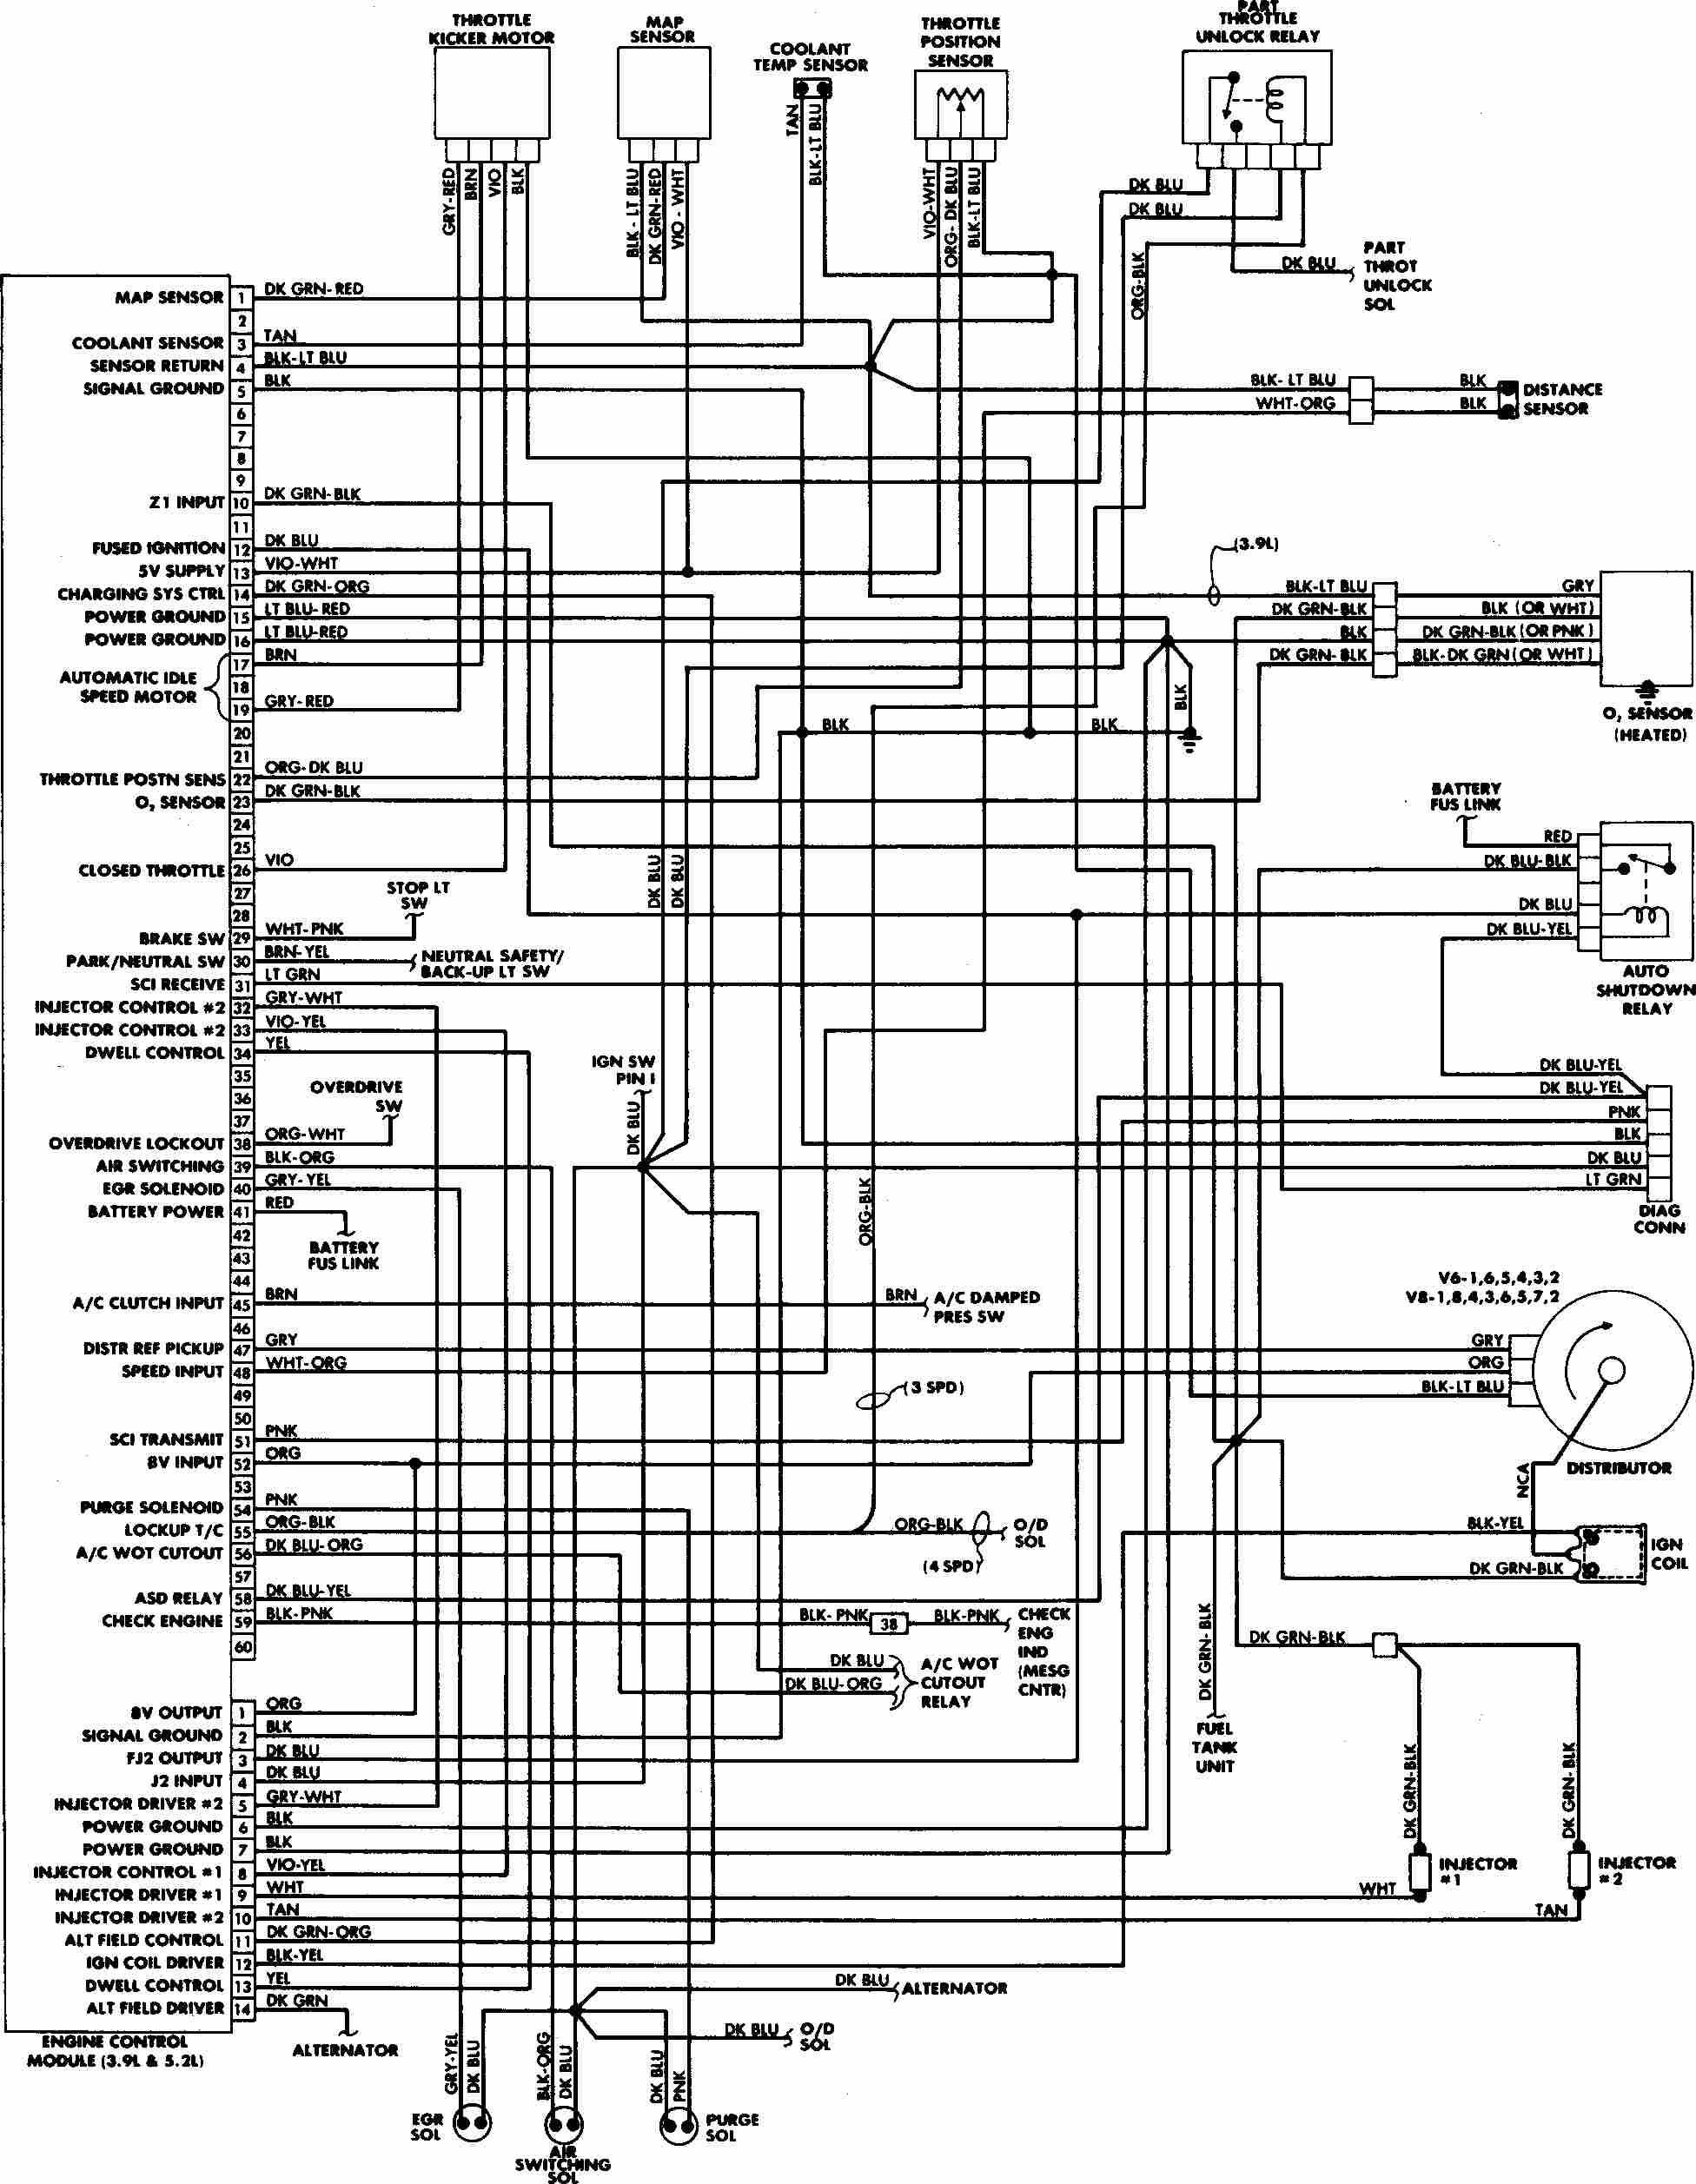 2003 Dodge Dakota Engine Diagram Alternator Wiring Diagram Delco 10si Begeboy Wiring Diagram Source